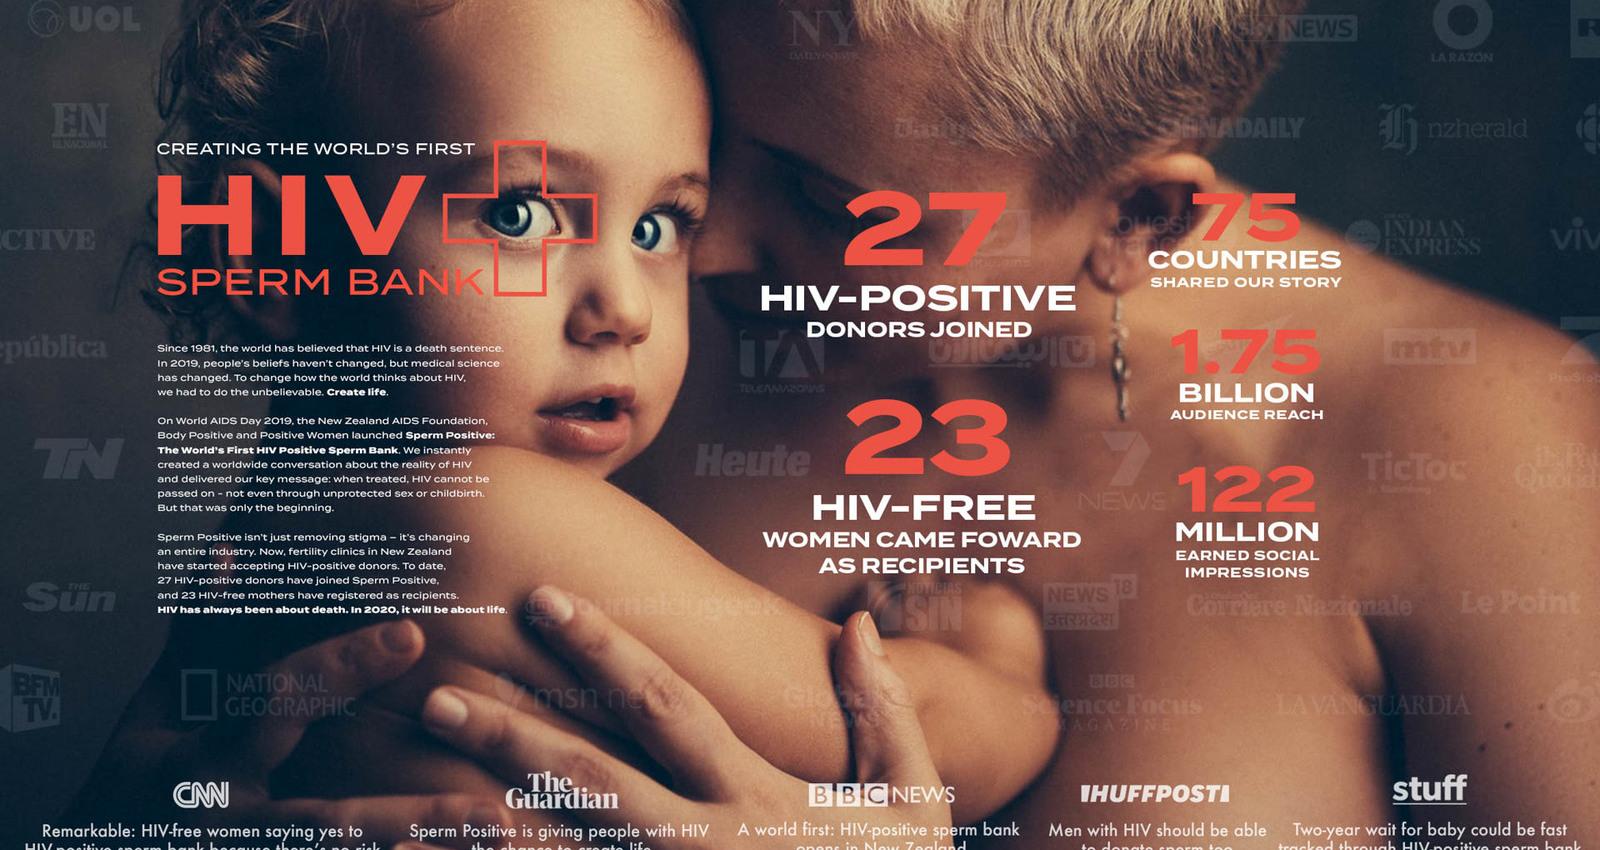 The HIV Positive Sperm Bank